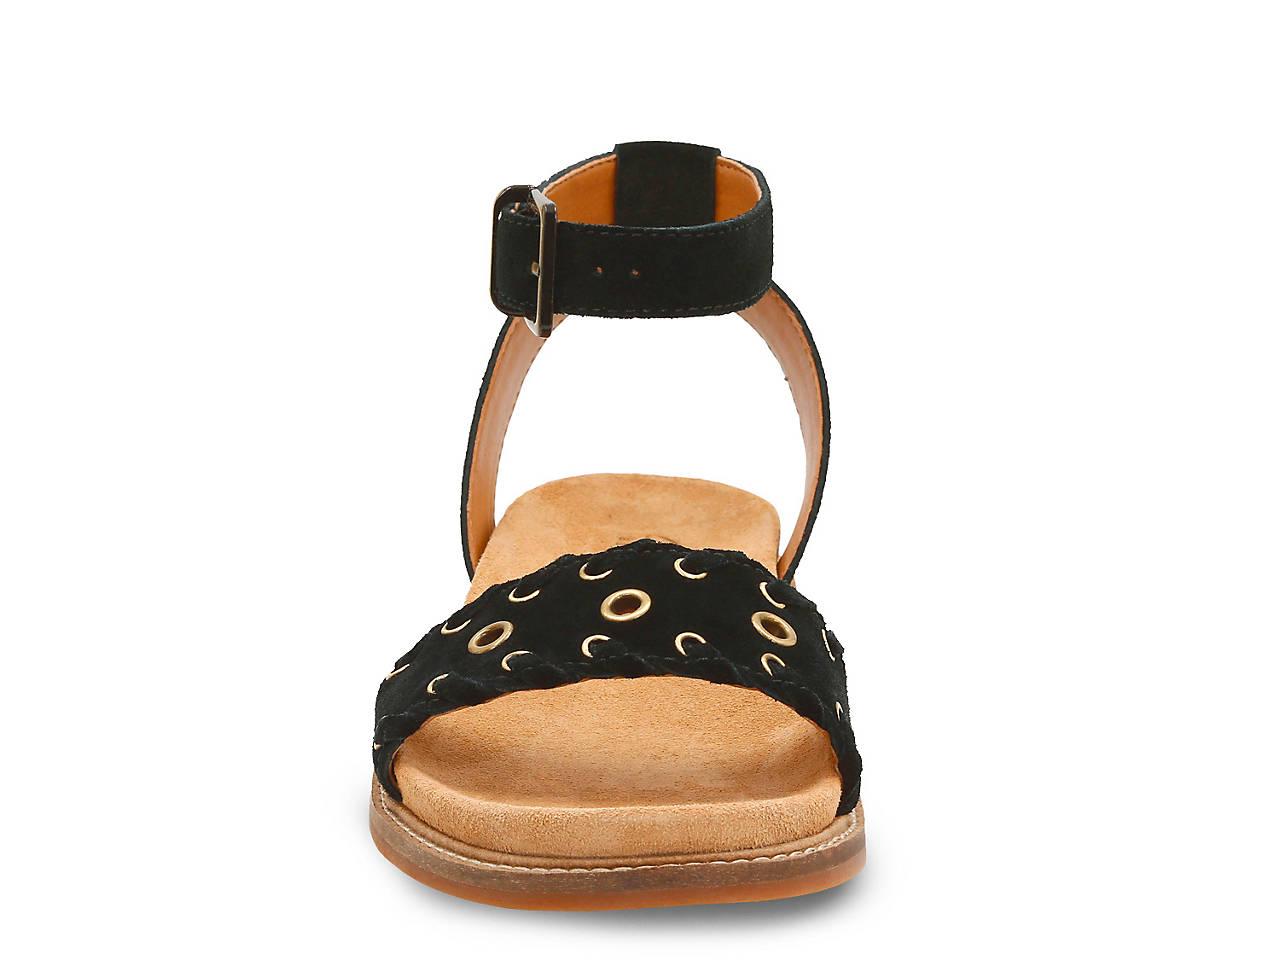 a8f919703 Clarks Corsio Amelia Flat Sandal Women s Shoes